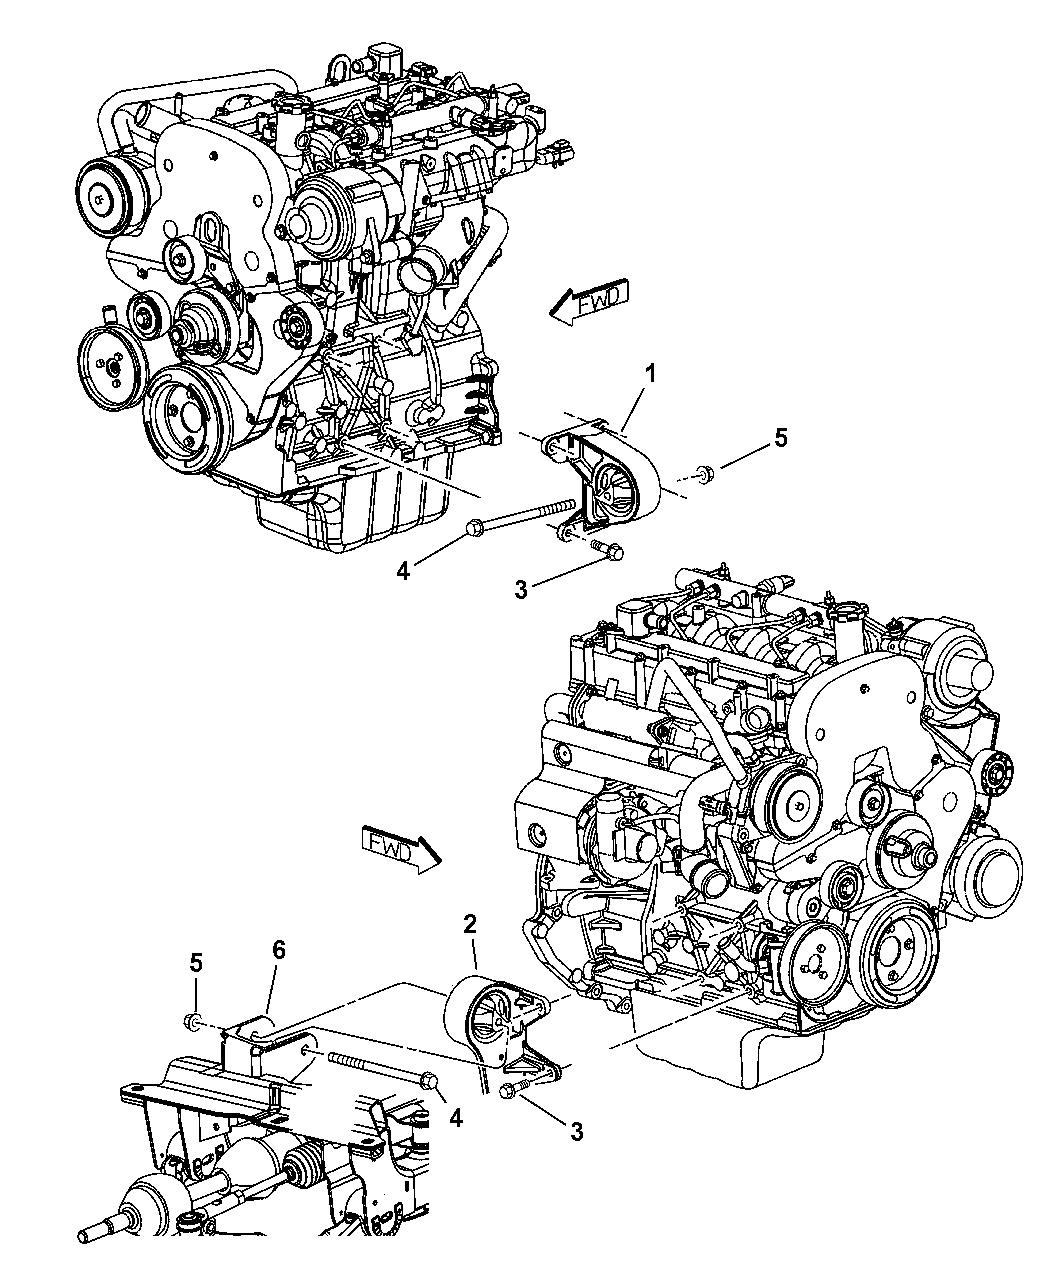 Bestseller: 2002 Jeep Liberty Engine Diagram